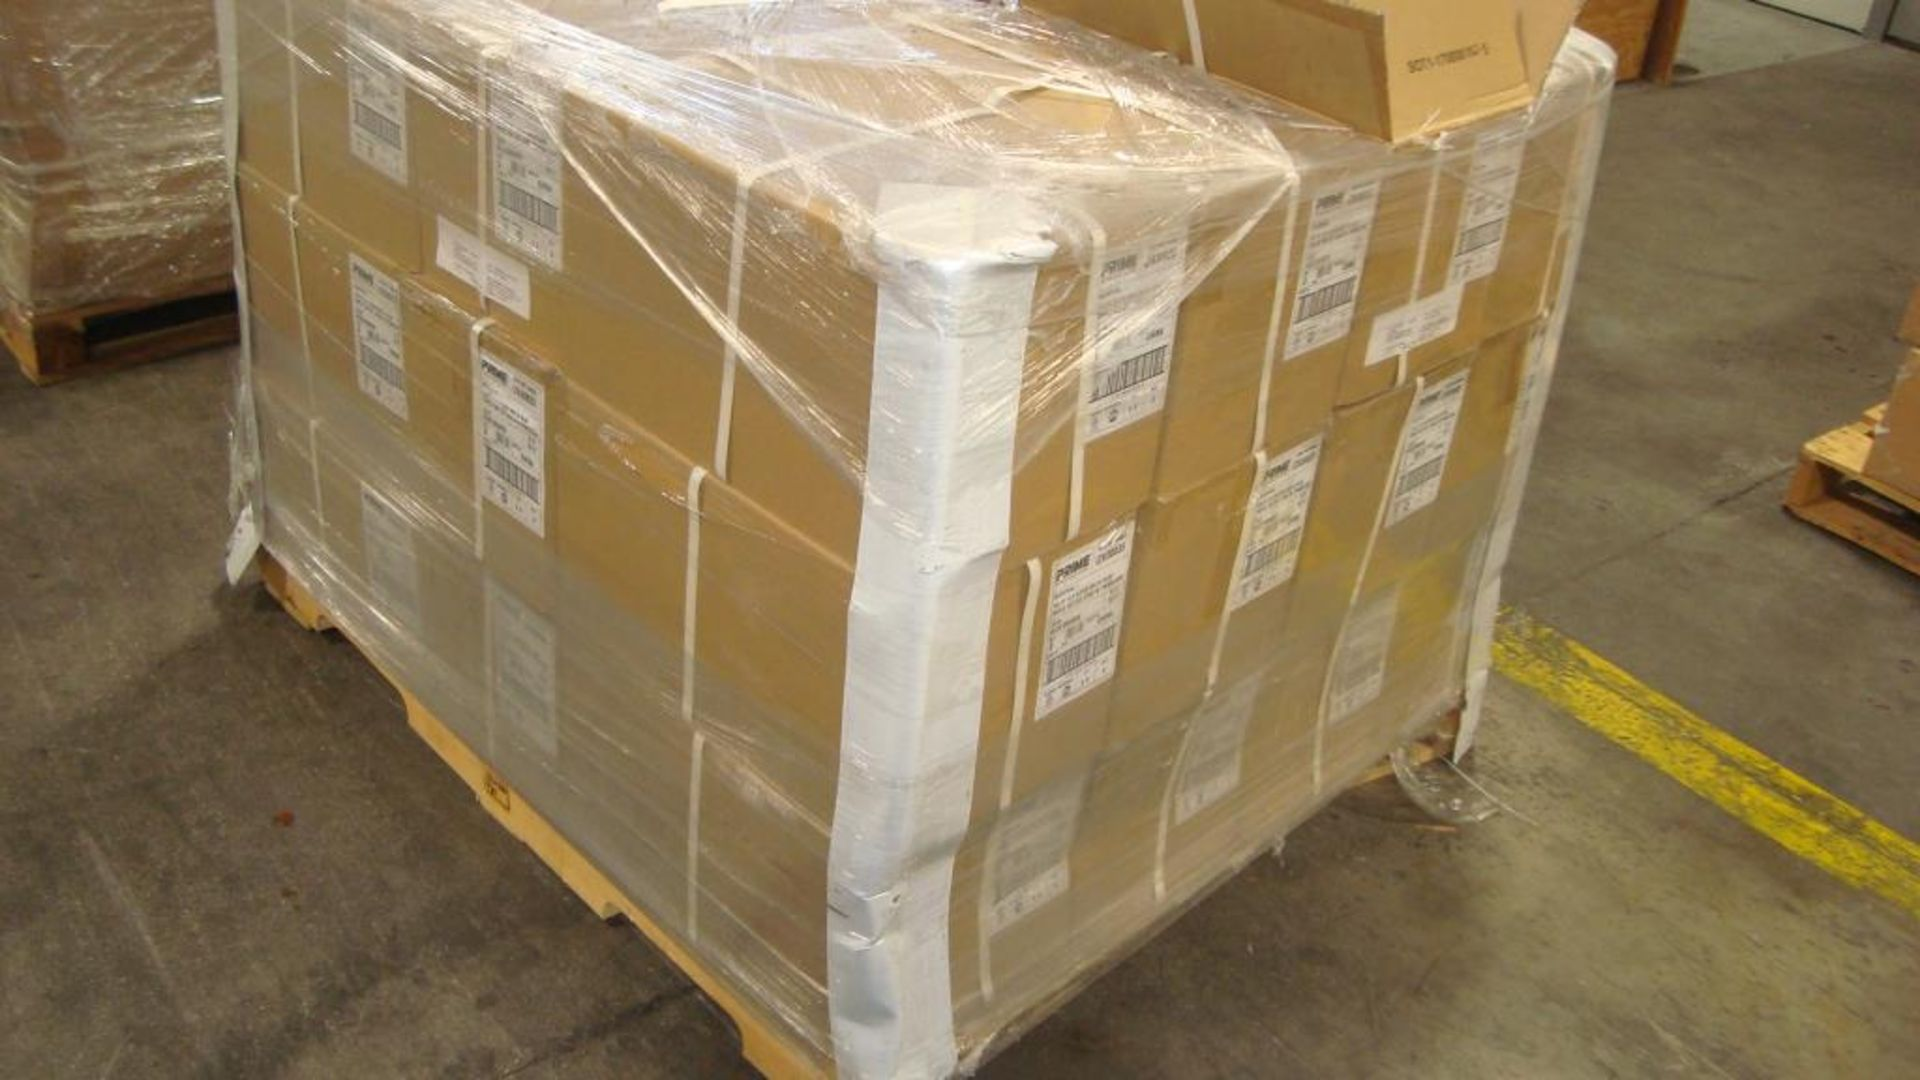 Extension Cords. Lot: 90 Total (30 Boxes - 3 ea.) Prime Wire & Cable pn# LT630835 Arctic Blue 100 - Image 7 of 9